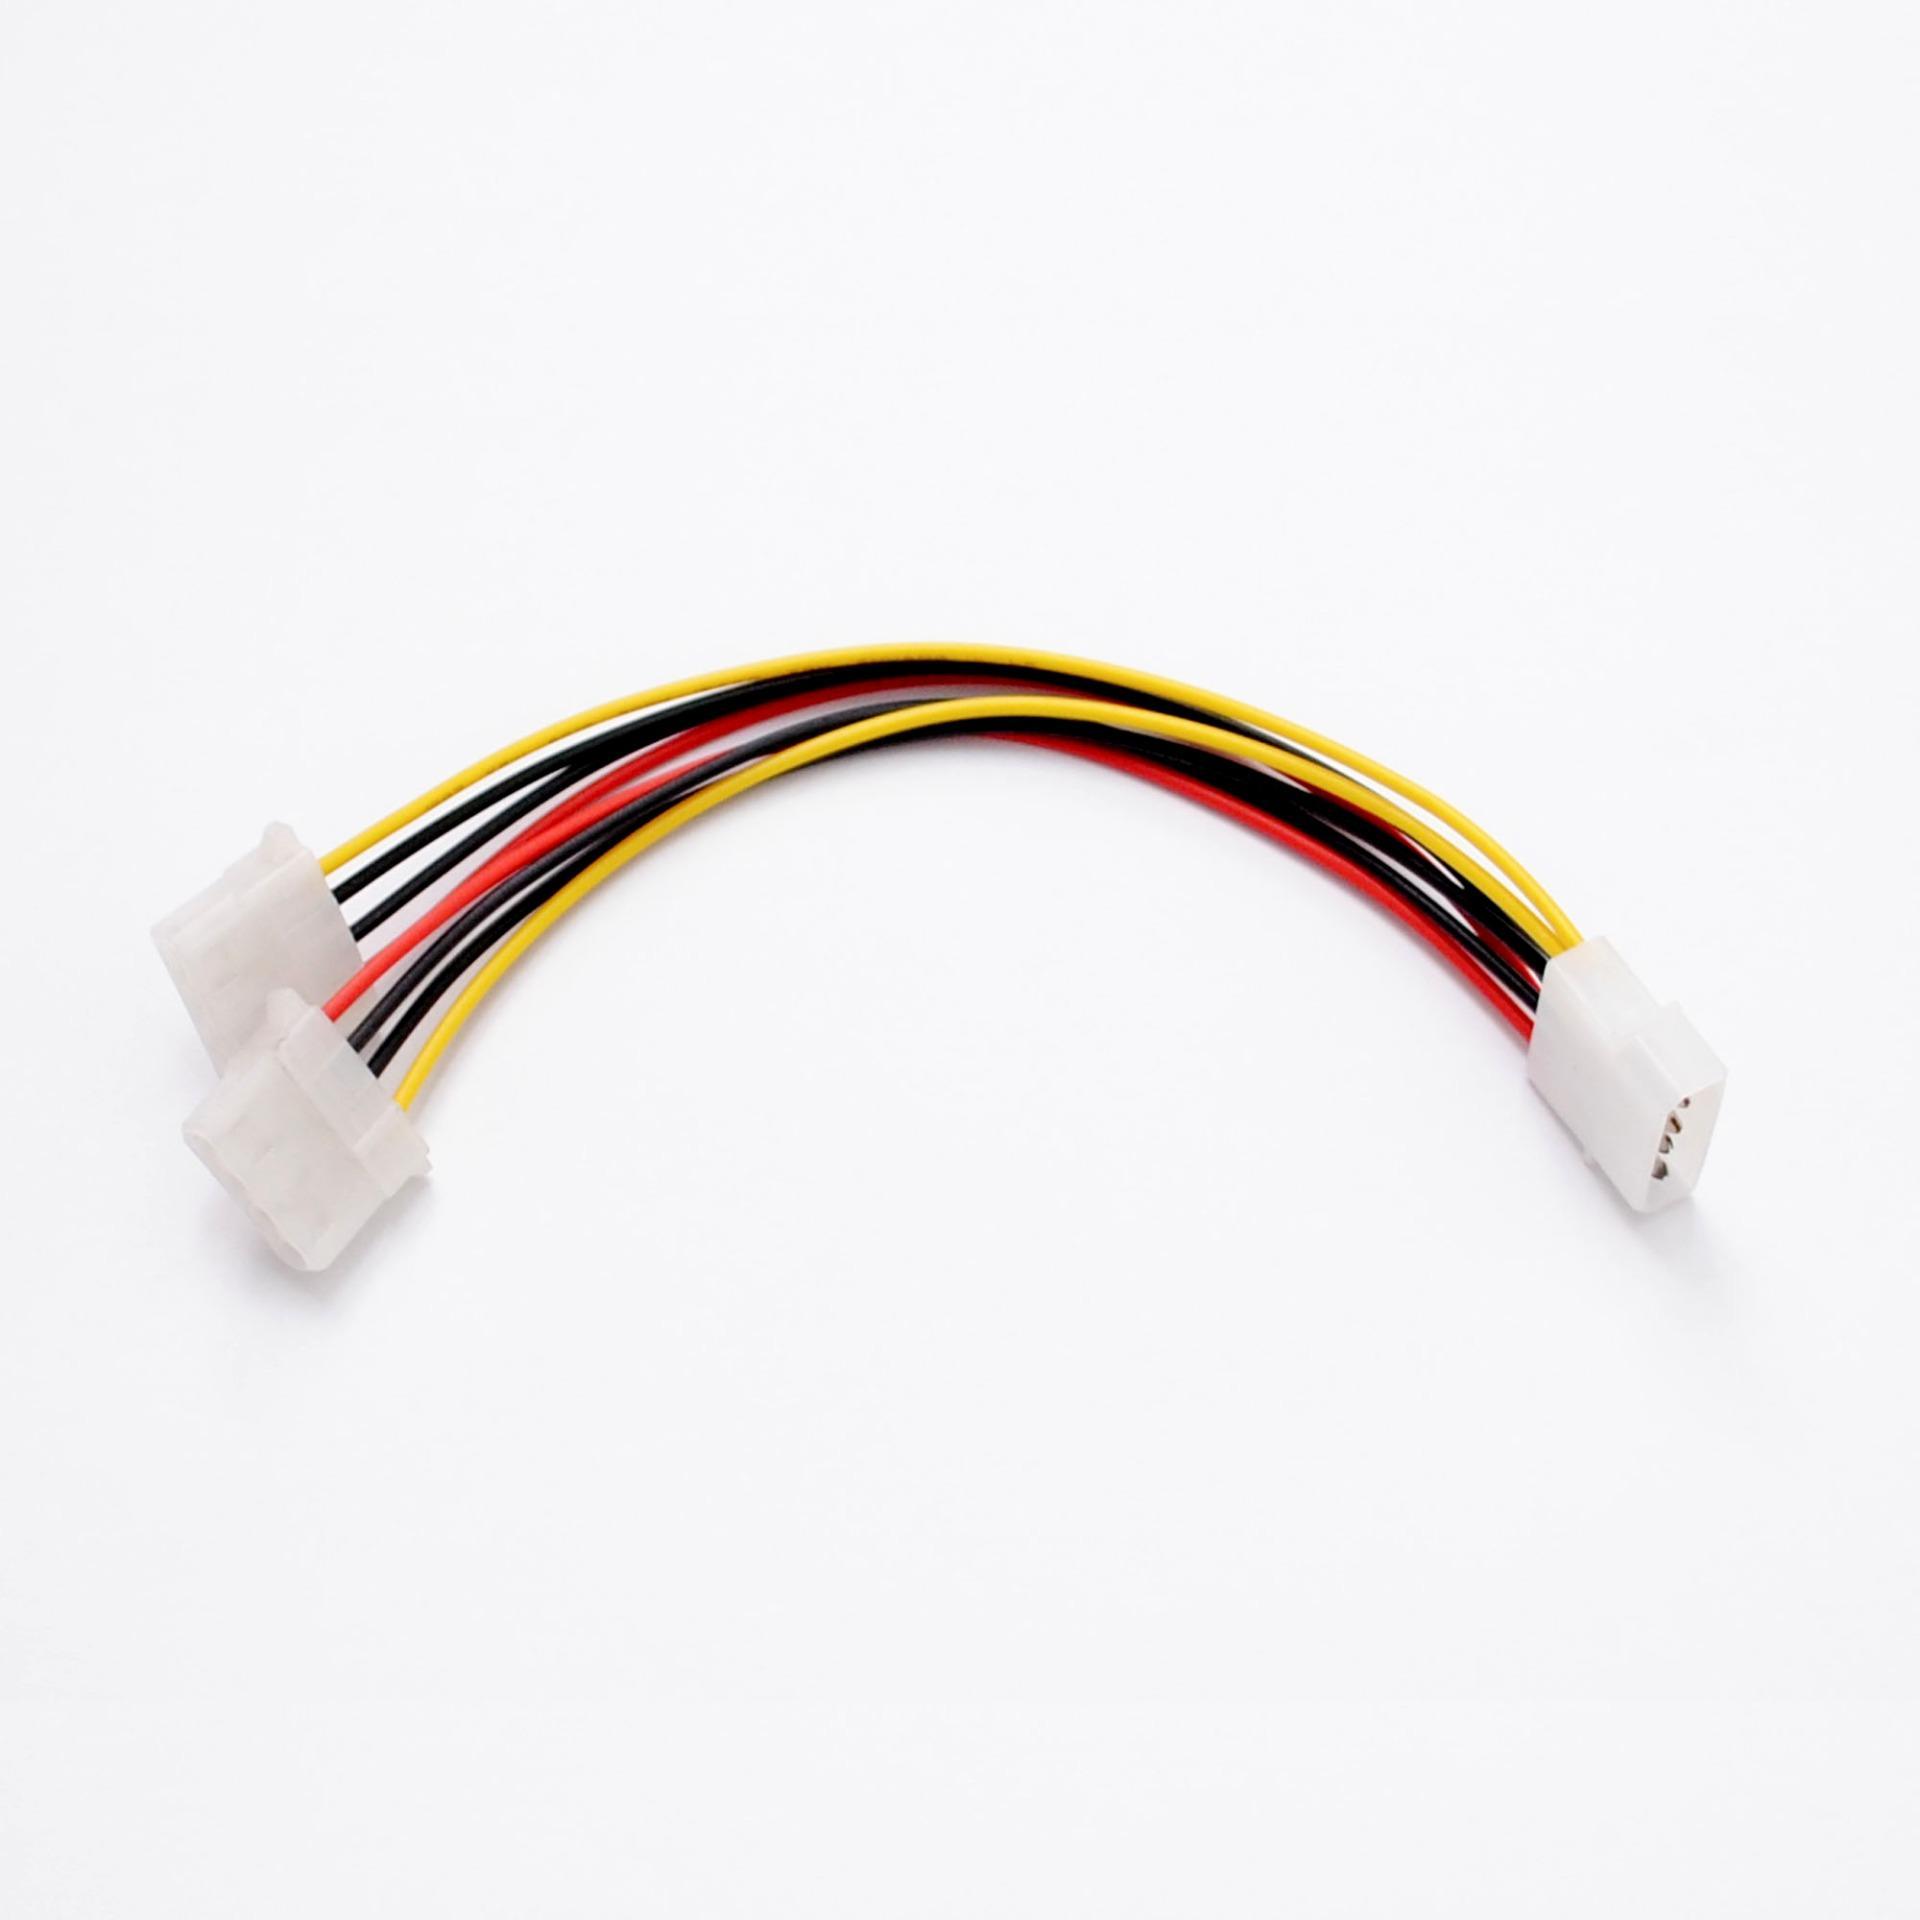 Erfreut 15 Pin Vga Kabel Schaltplan Ideen - Elektrische Schaltplan ...